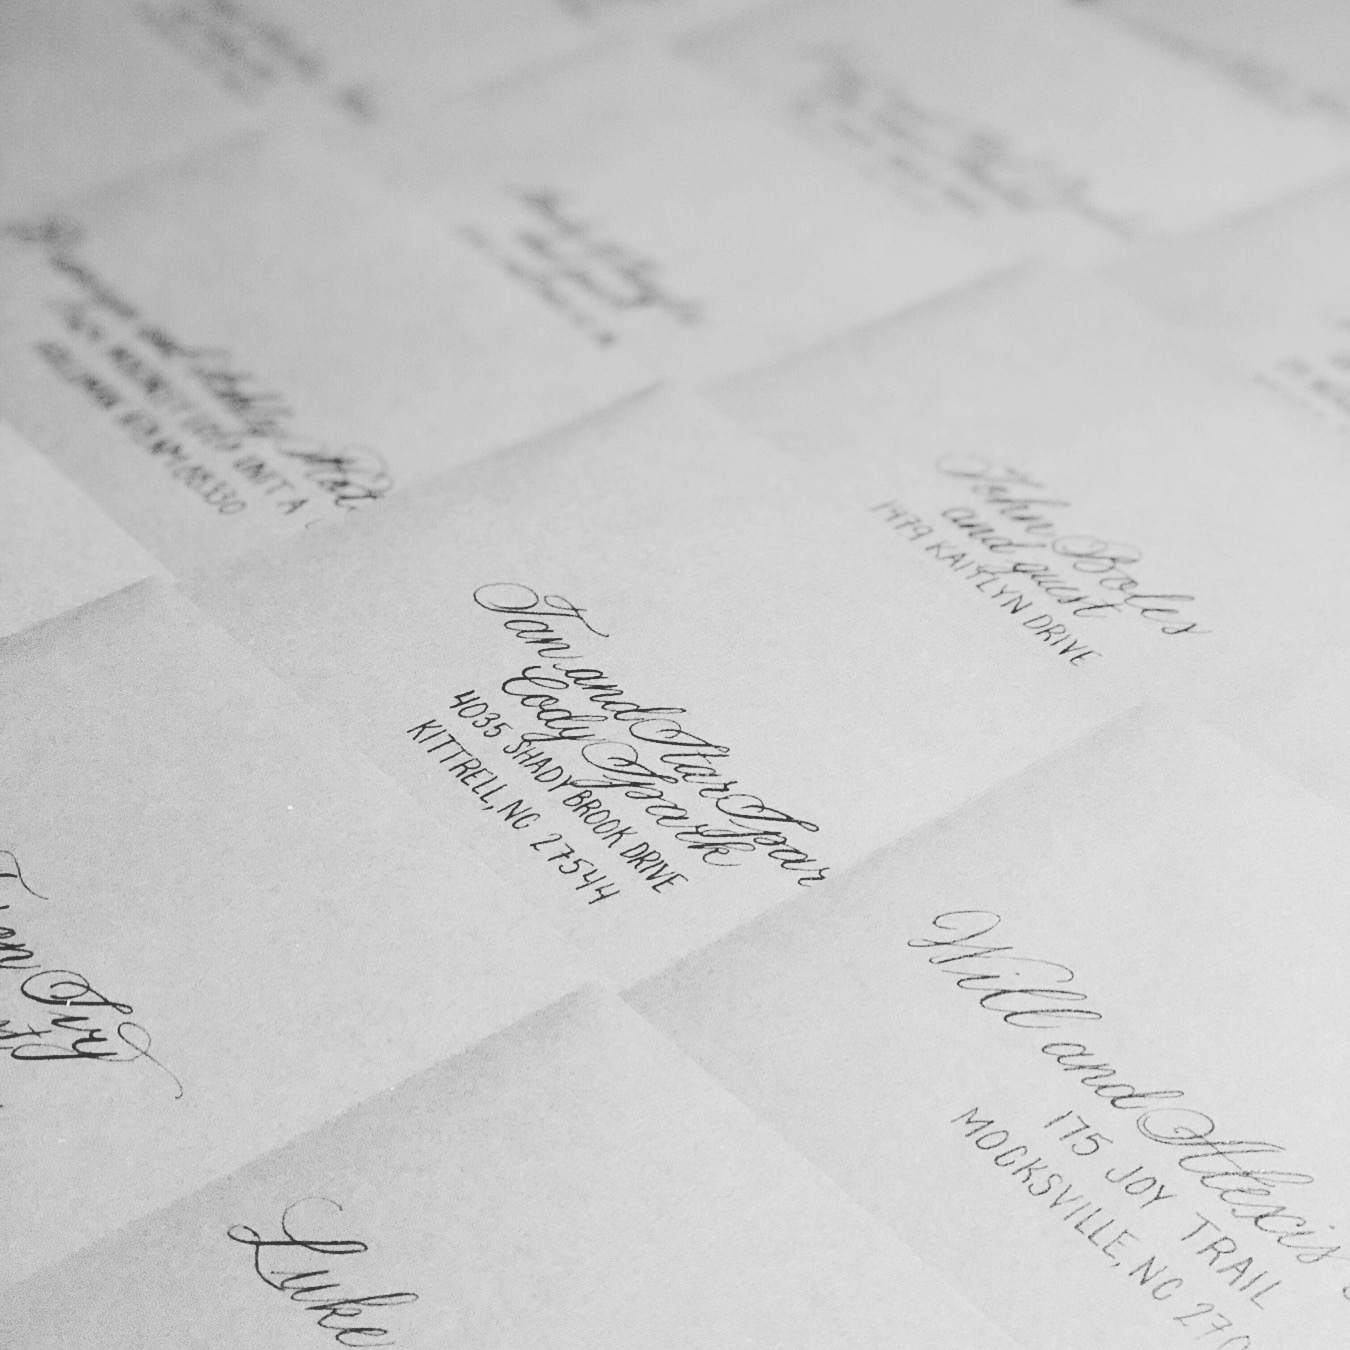 Central PA, York PA, JesSmith Designs, custom, wedding, invitations, bridal, announcements, save the date, baby, hanover, calligraphy, baltimore, wedding invitations, lancaster, gettysburg-03-25 19.17.47.jpg